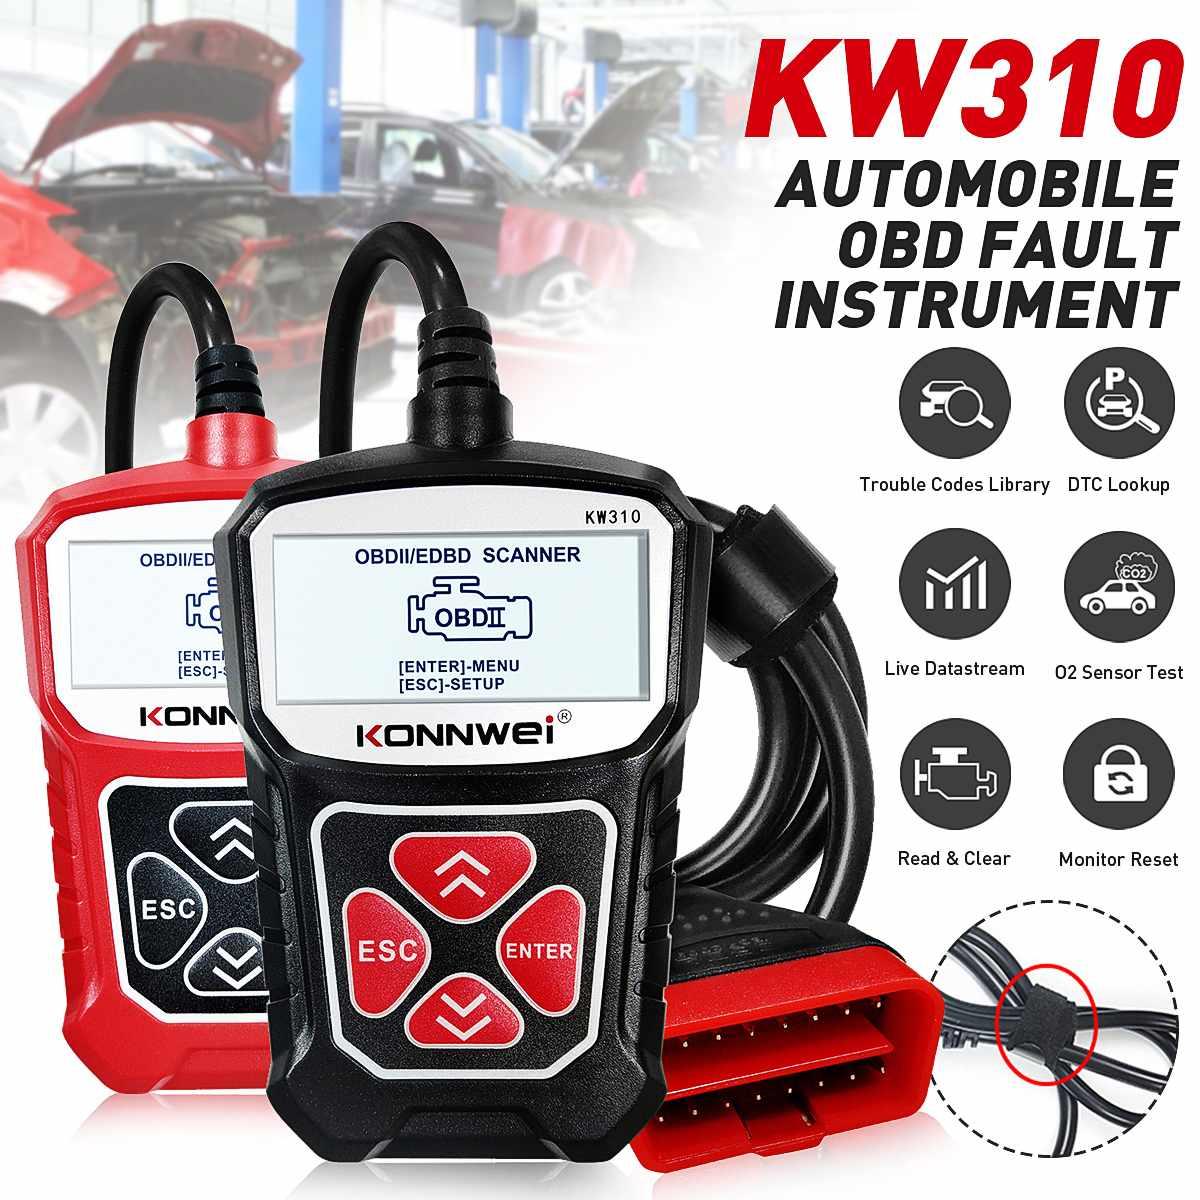 KONNWEI KW310 OBD2 Scanner OBD Universal Auto Diagnostic Tool Check Engine Code Reader Automotive Diagnostic Tool for Auto Car